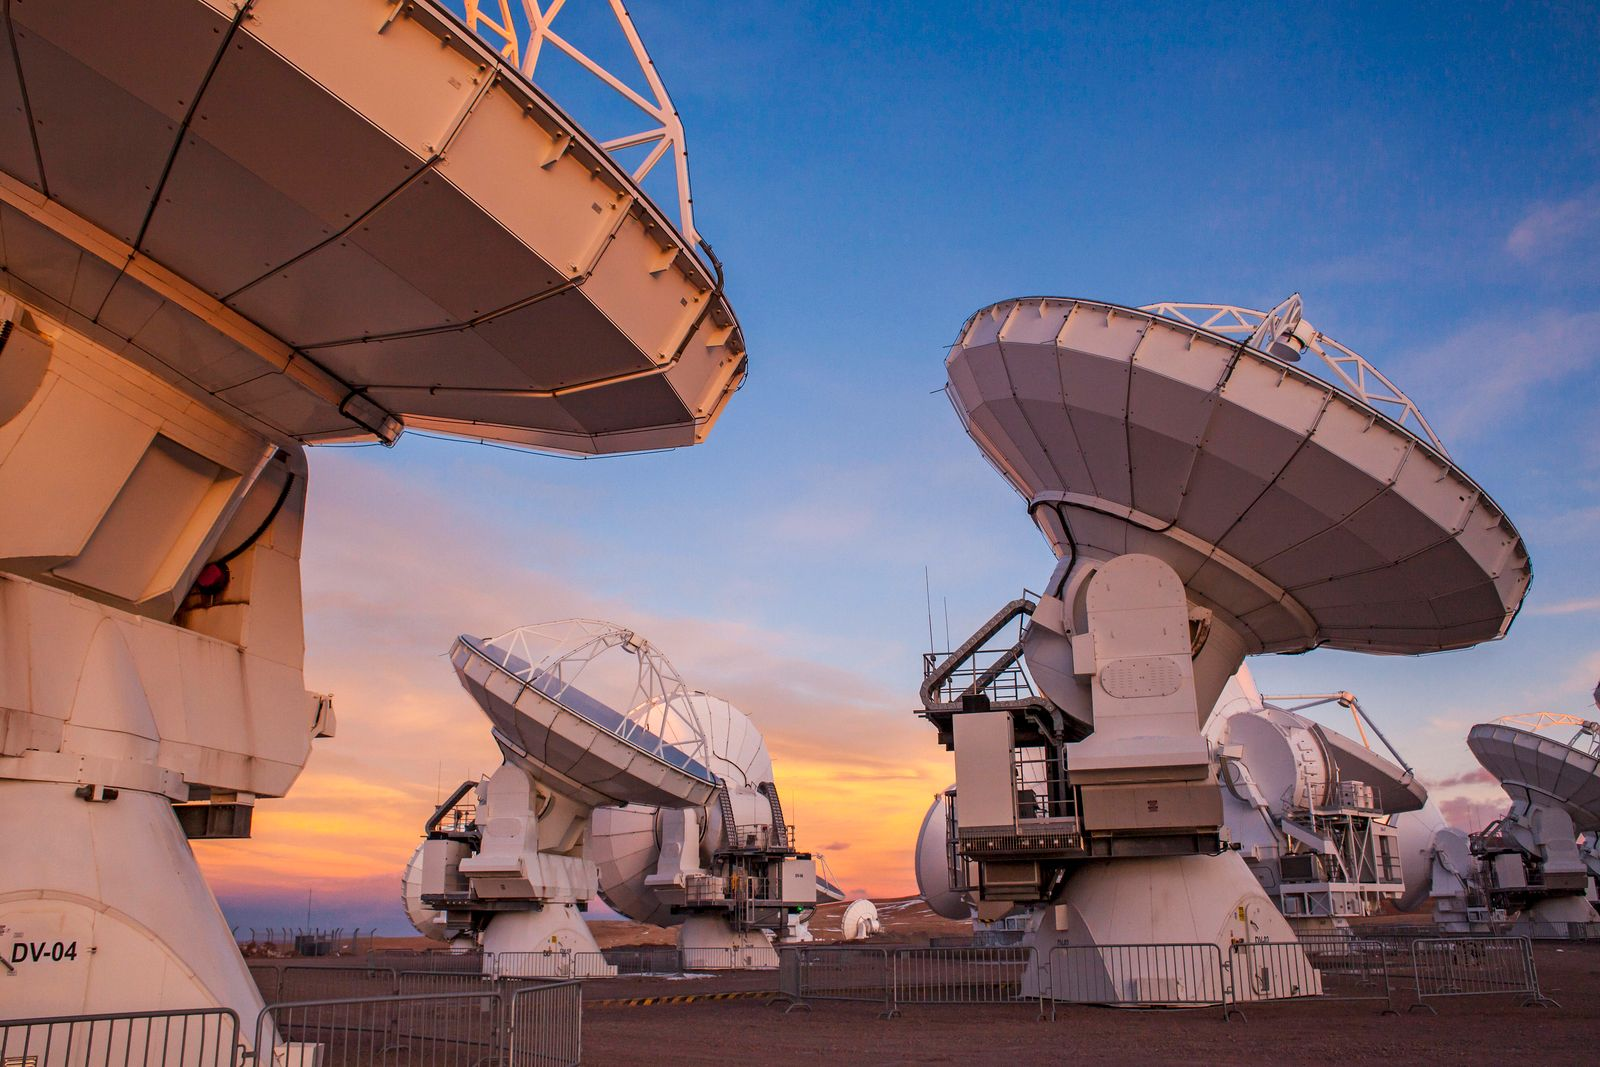 ALMA observatory, Antennas in plain of Chajnantor, 5000 meters of altitude,Array Operations Site (AOS), Atacama desert.